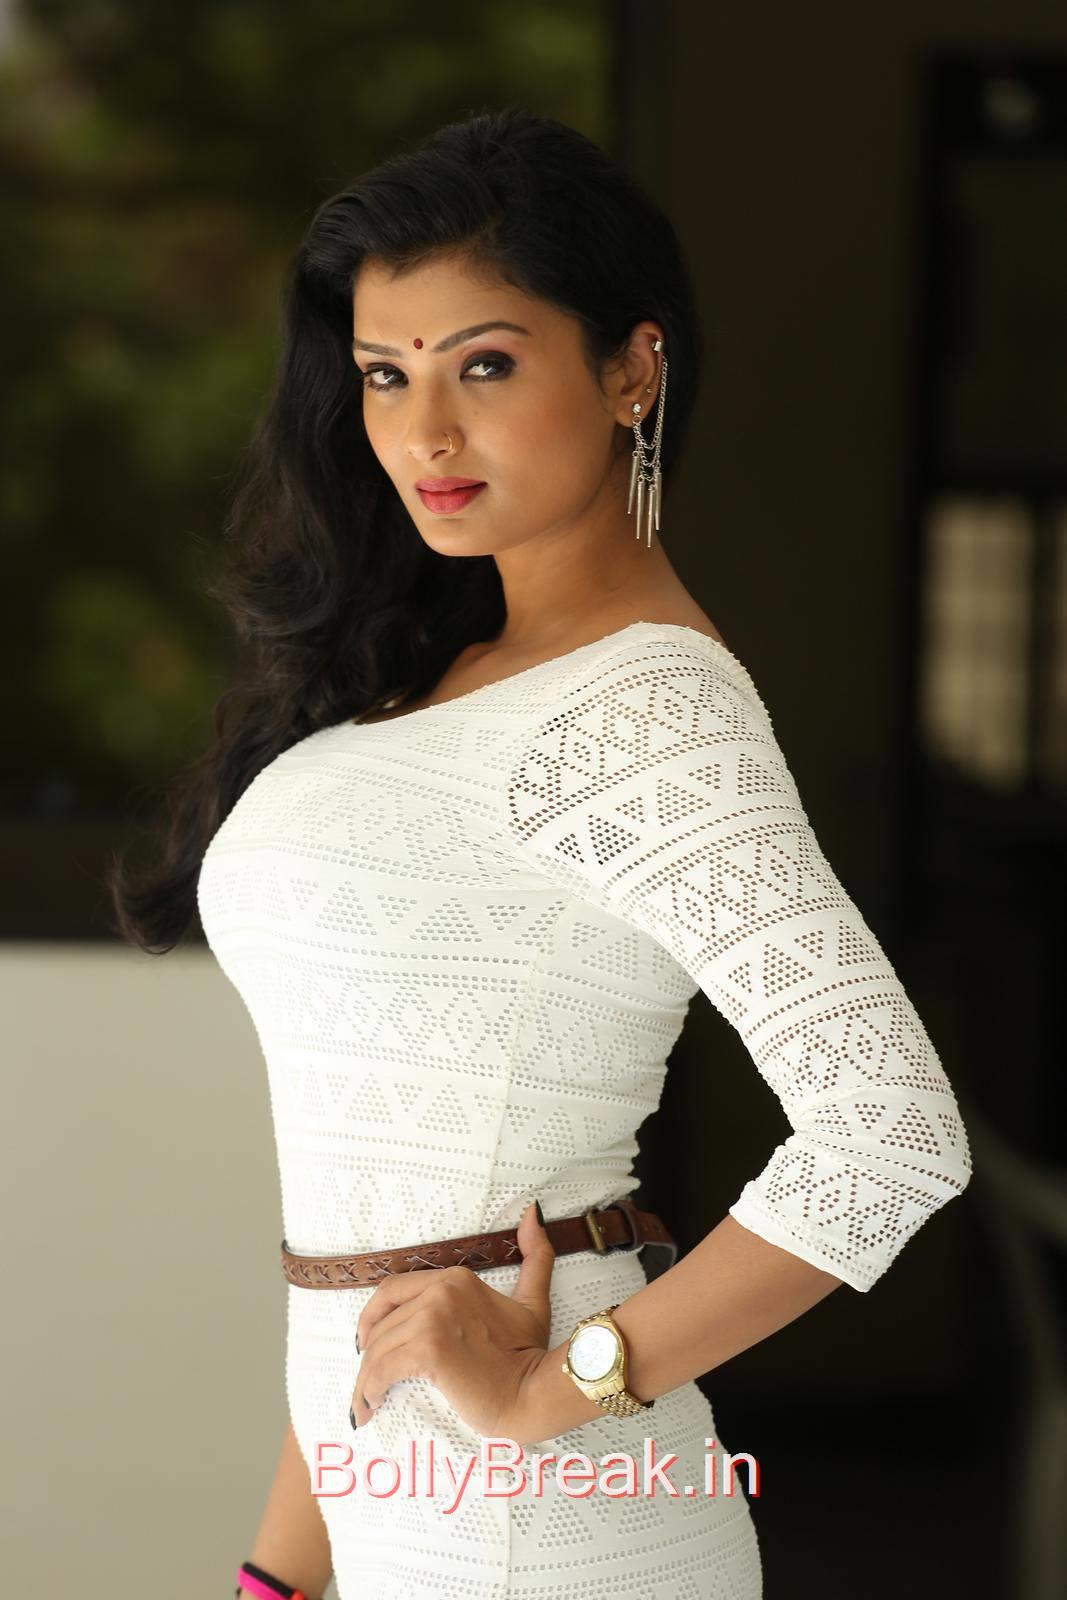 Ishita Unseen Stills, Actress Ishita Side Pose Hot Photo Gallery in HD